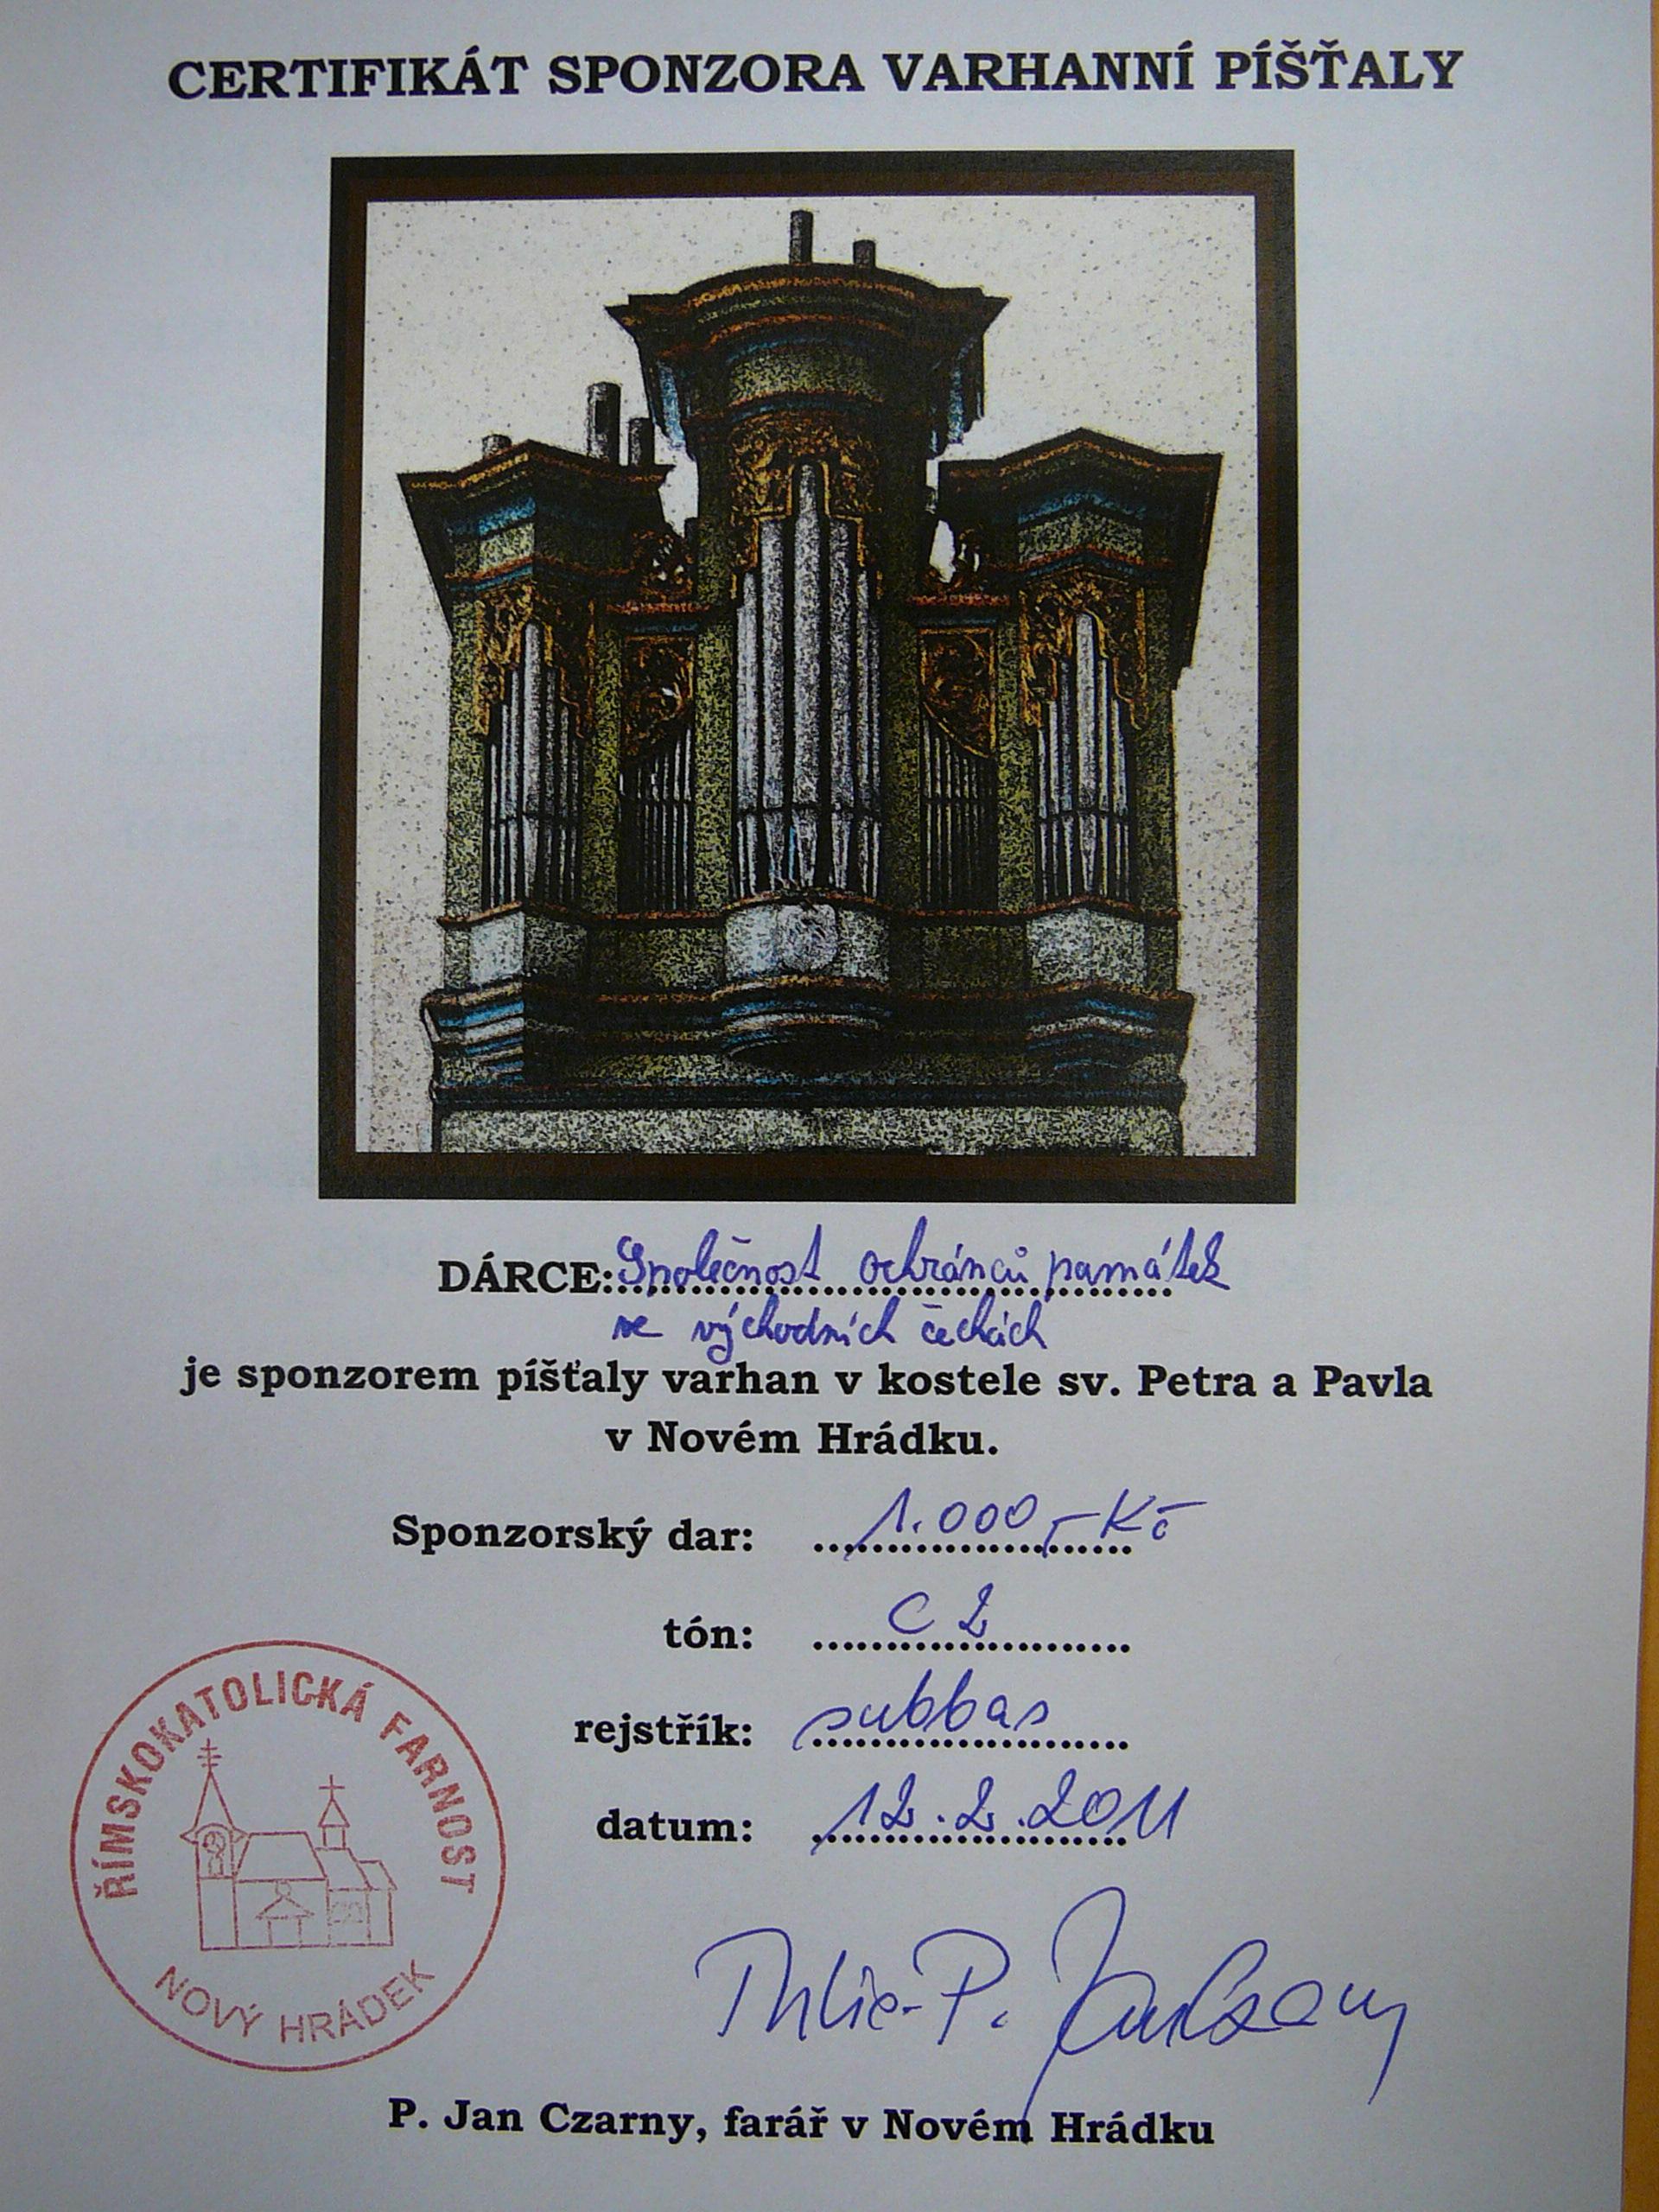 Certifikát o sponzorském daru